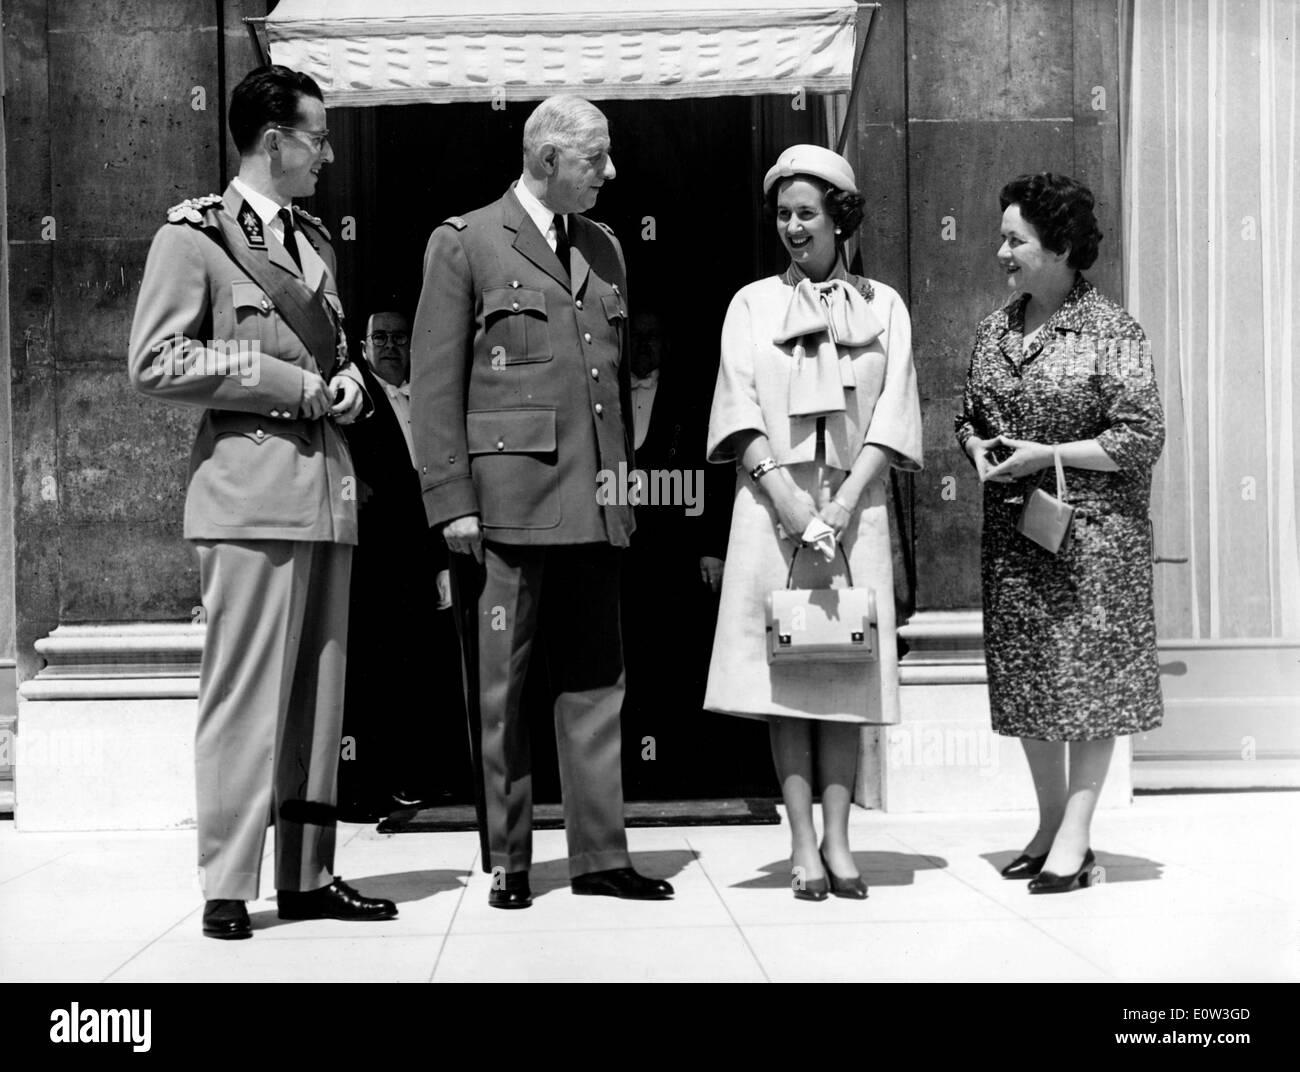 Belgian royalty visits Charles De Gaulle - Stock Image